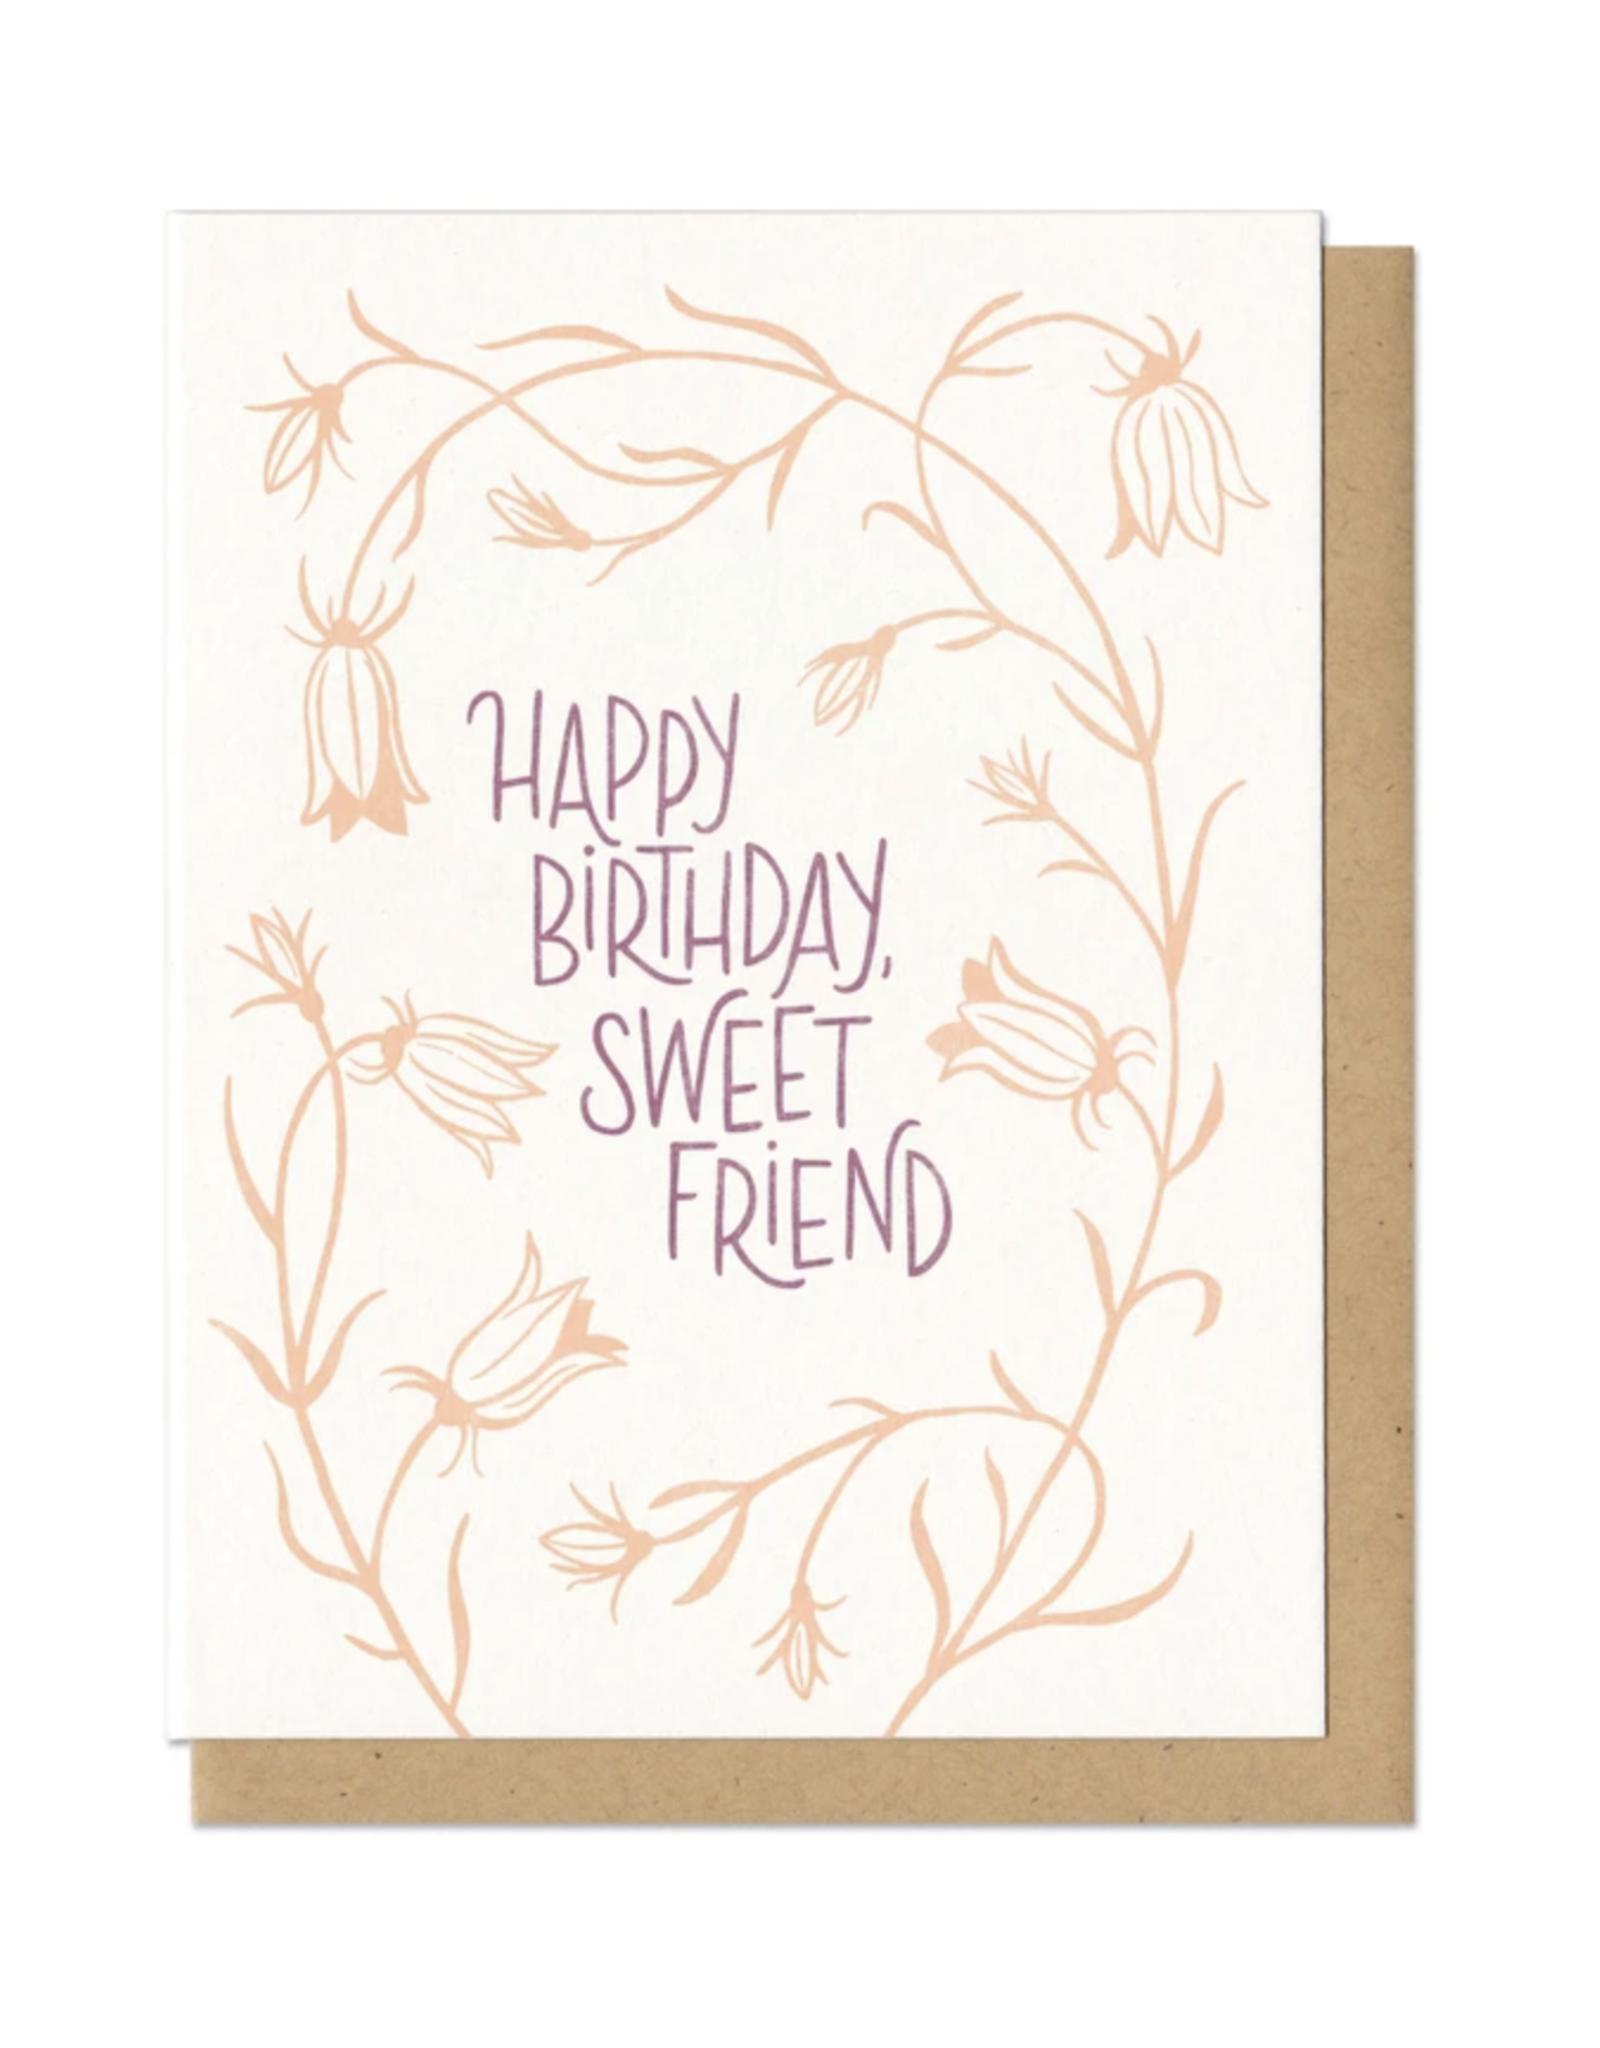 Happy Birthday, Sweet Friend Greeting Card